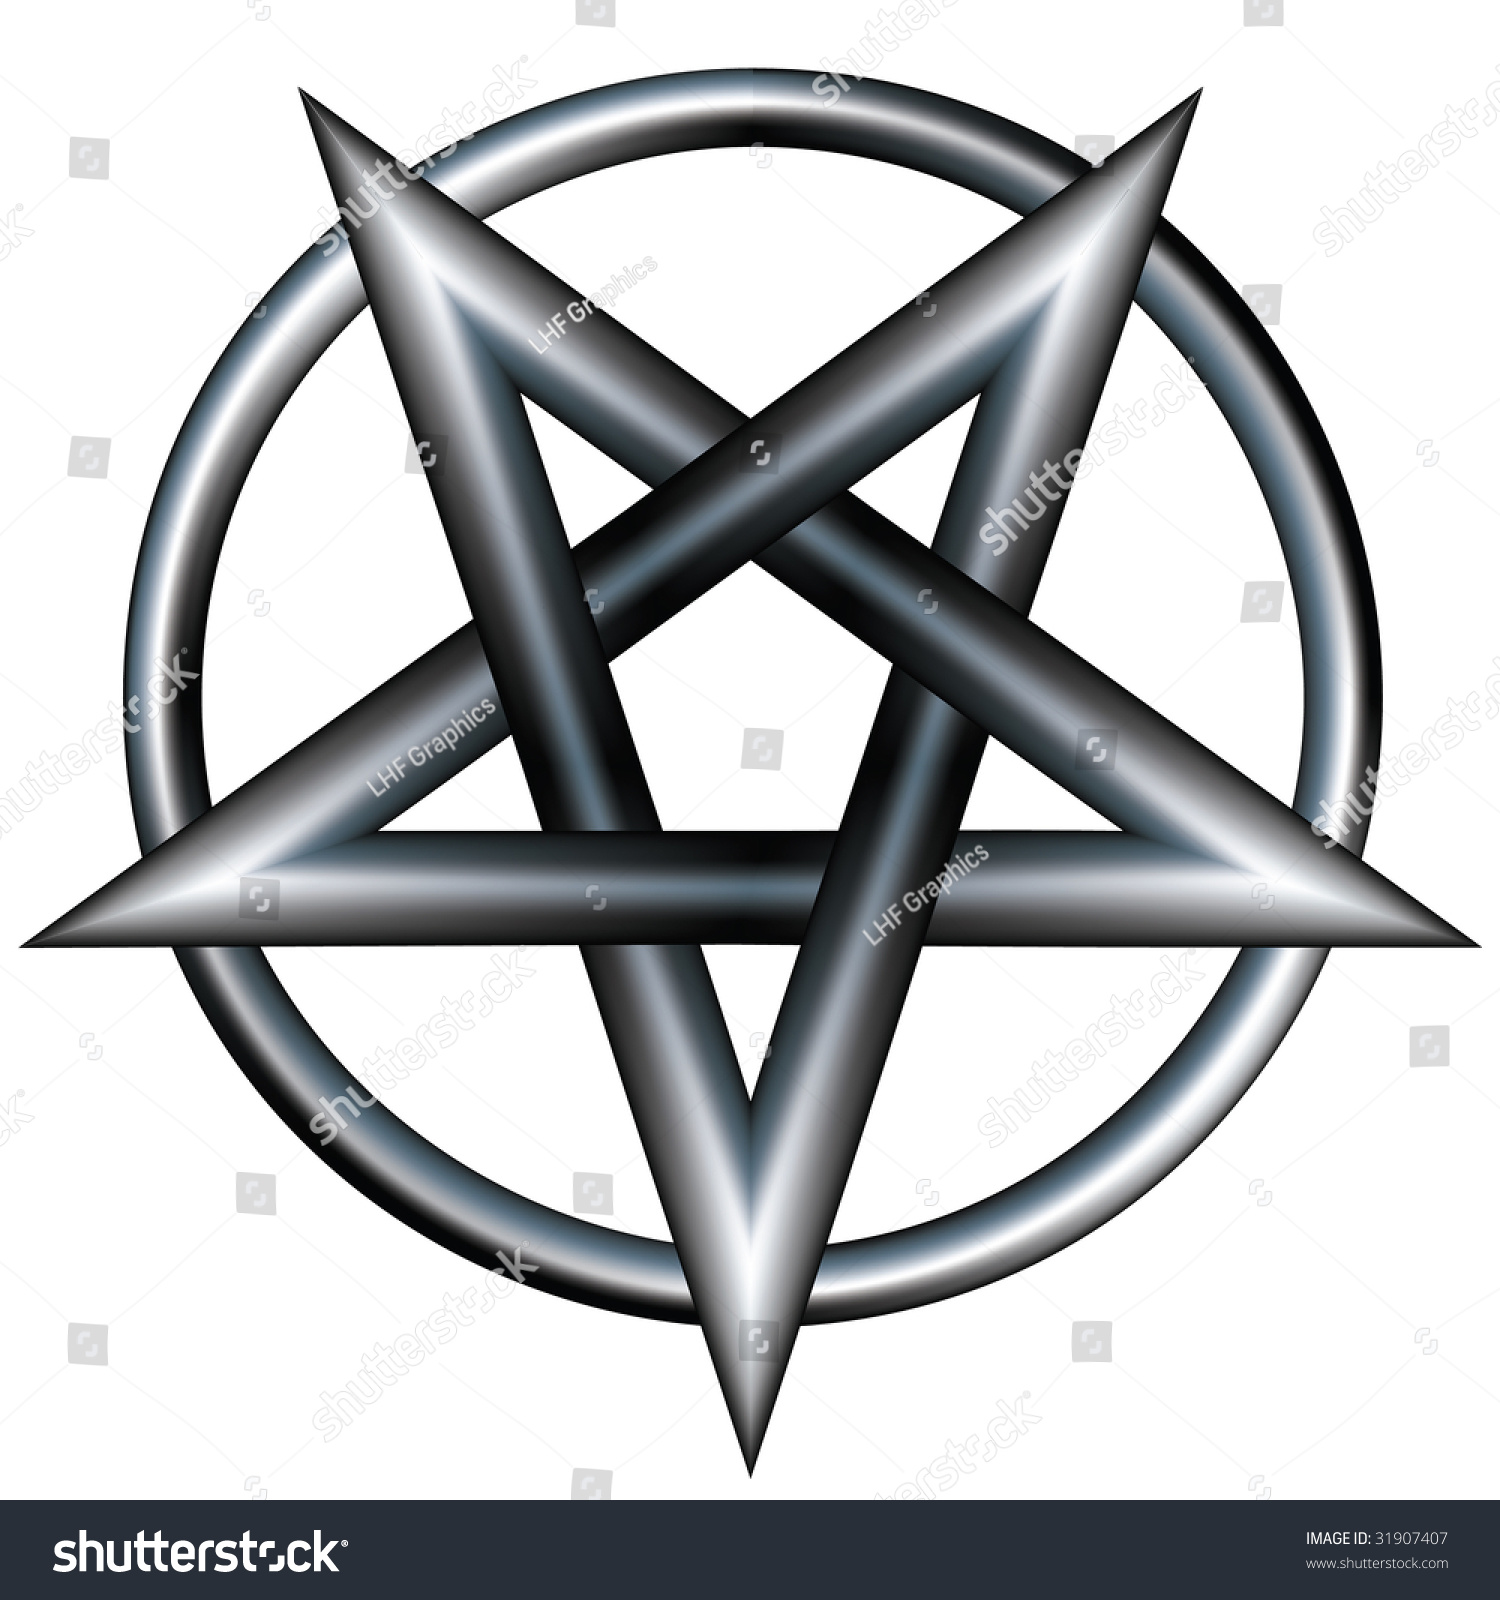 Pentagram Inside Circle Vector File Contains Stock Vector Royalty